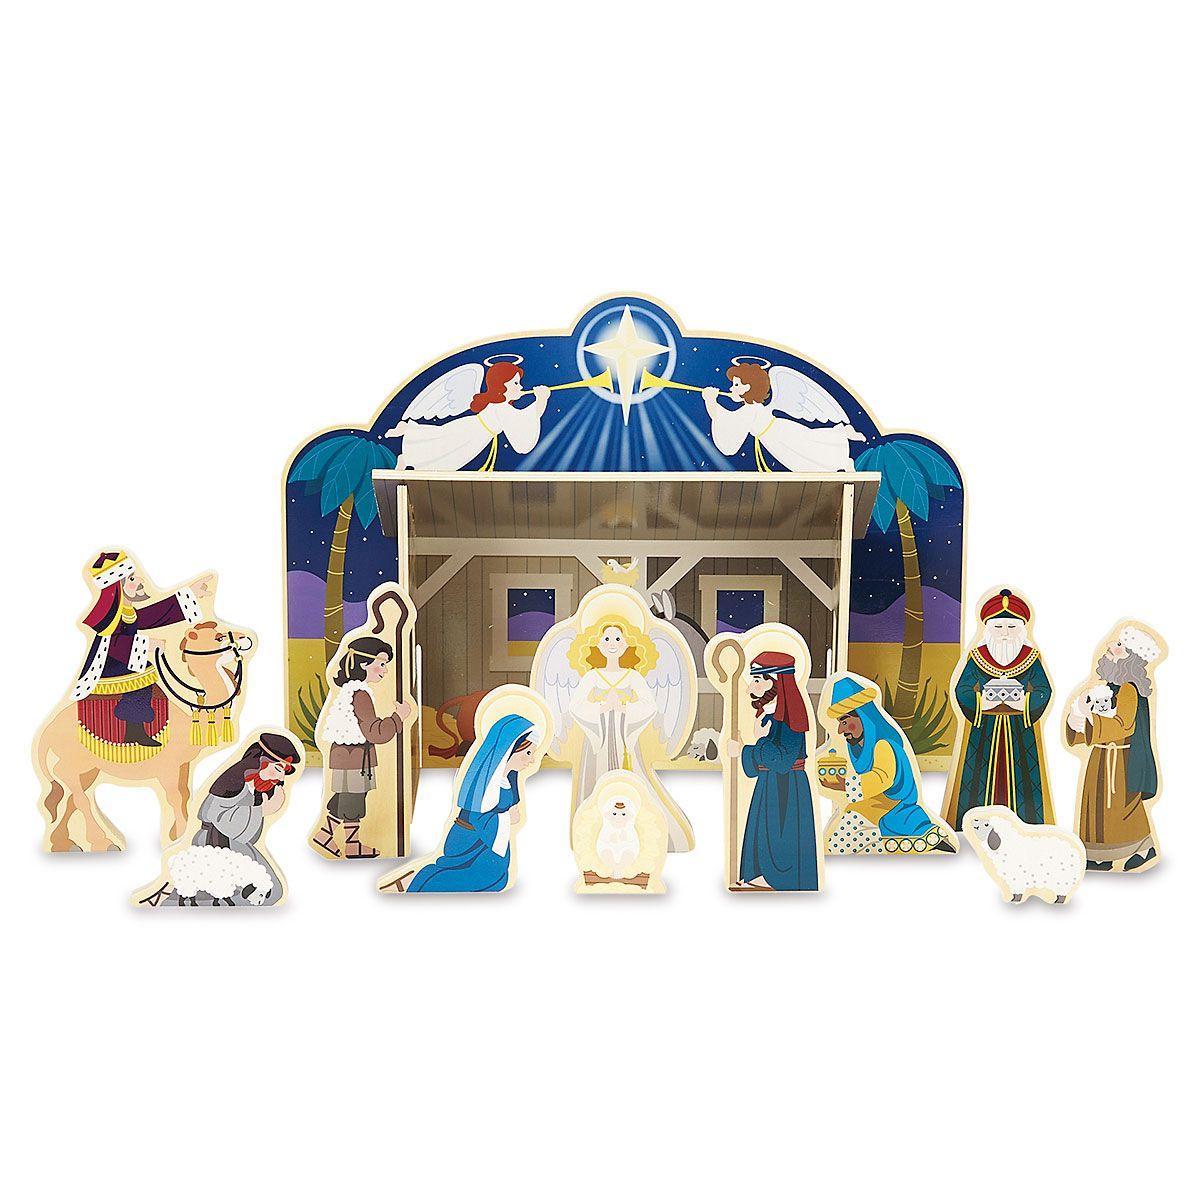 Wooden Christmas Nativity Set by Melissa & Doug®